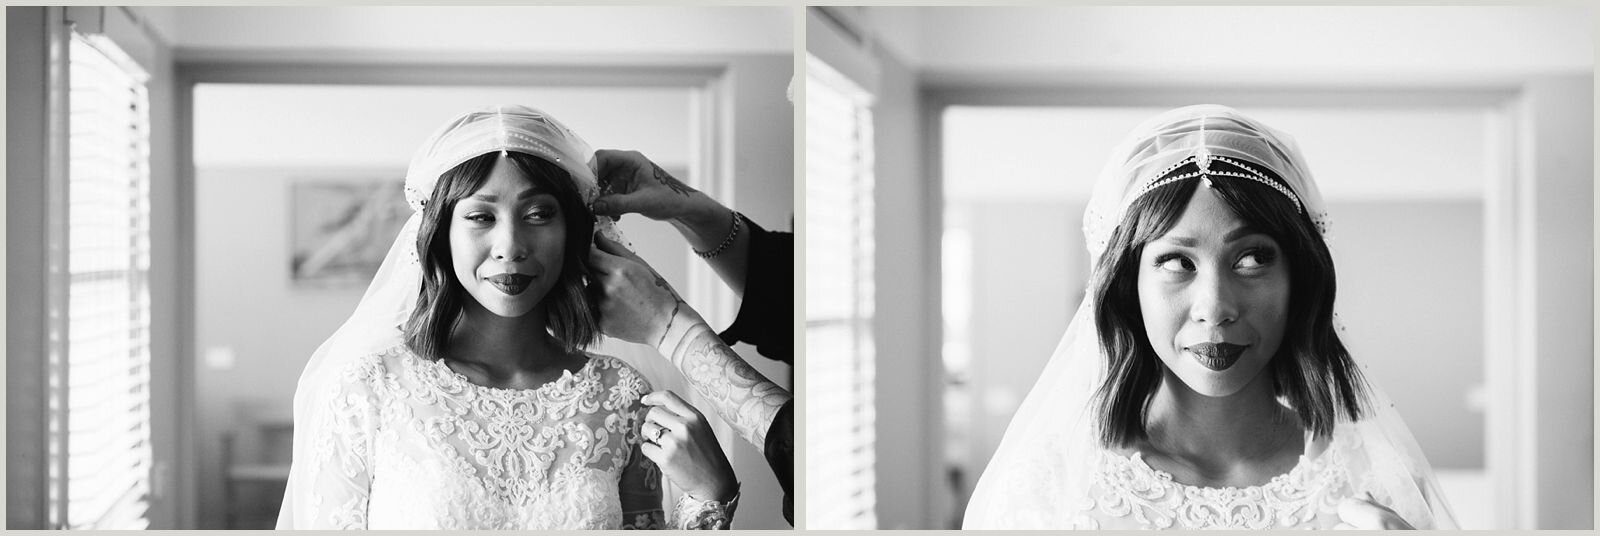 joseph_koprek_wedding_melbourne_the_prince_deck_0008.jpg